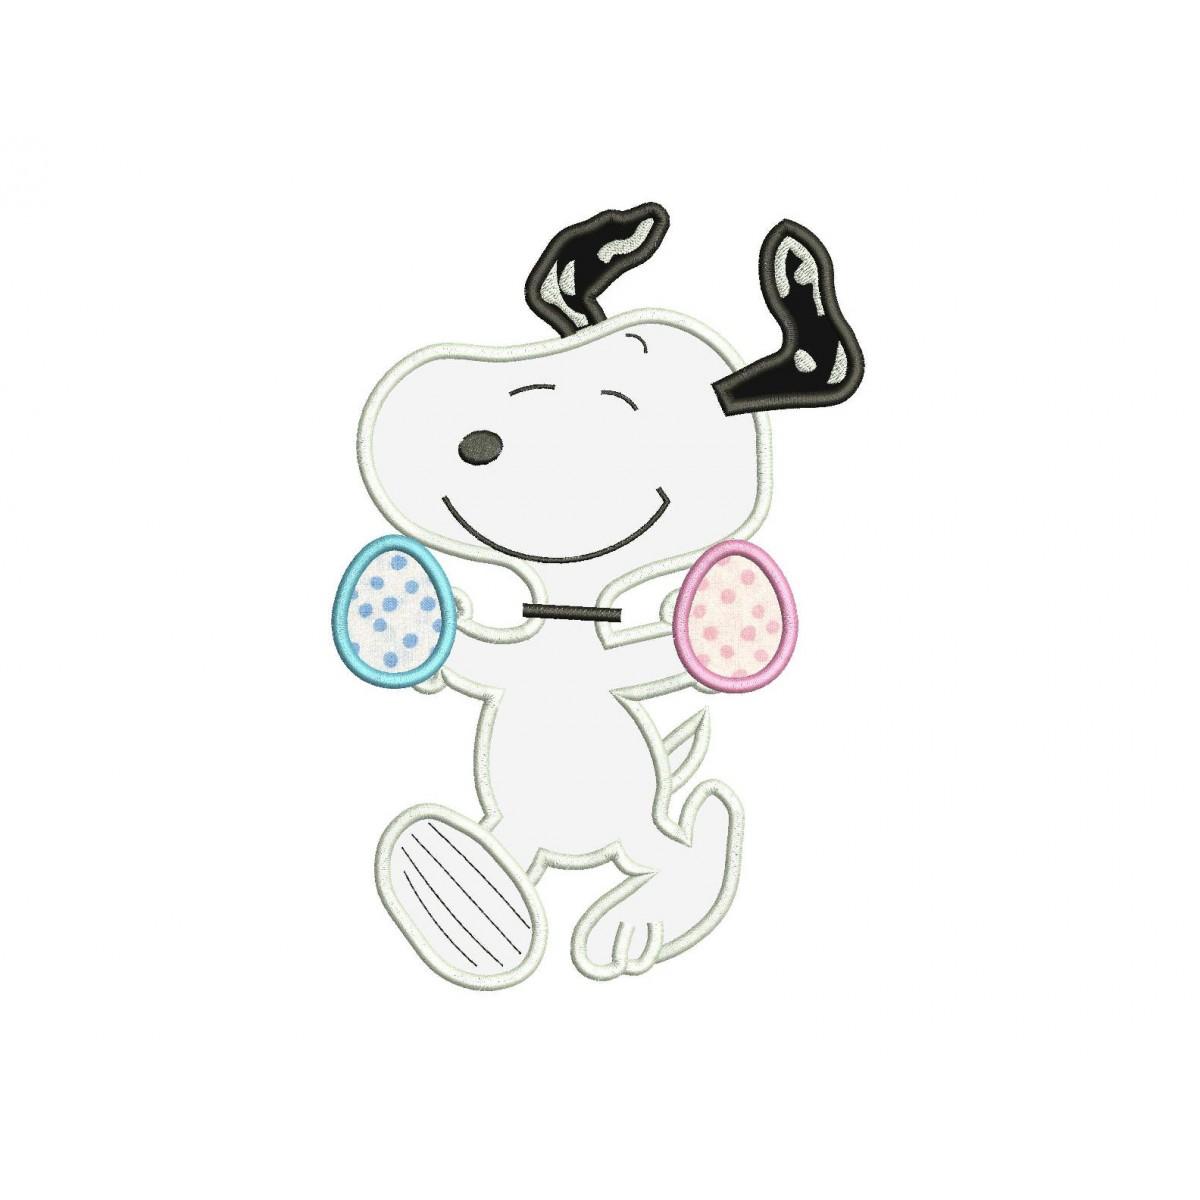 Snoopy Easter Egg Applique Design